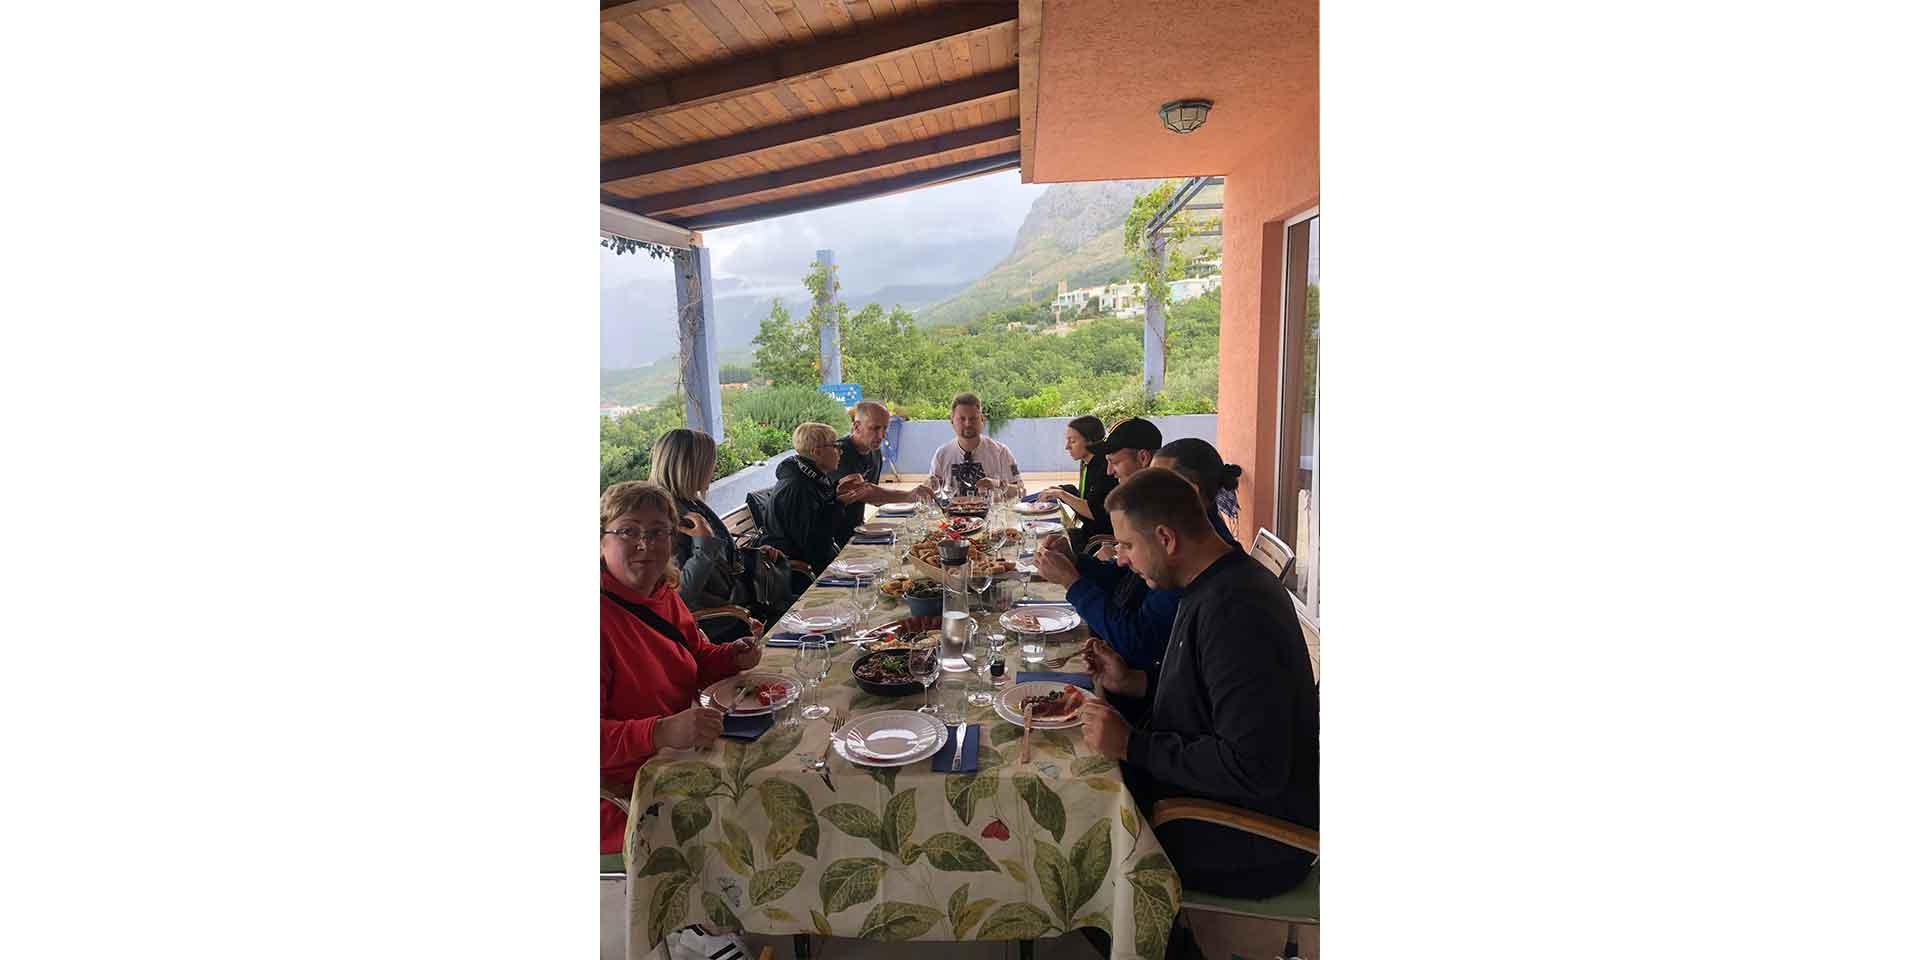 budva-caffes budva-food budva-activities montenegro budva-tourist-organization